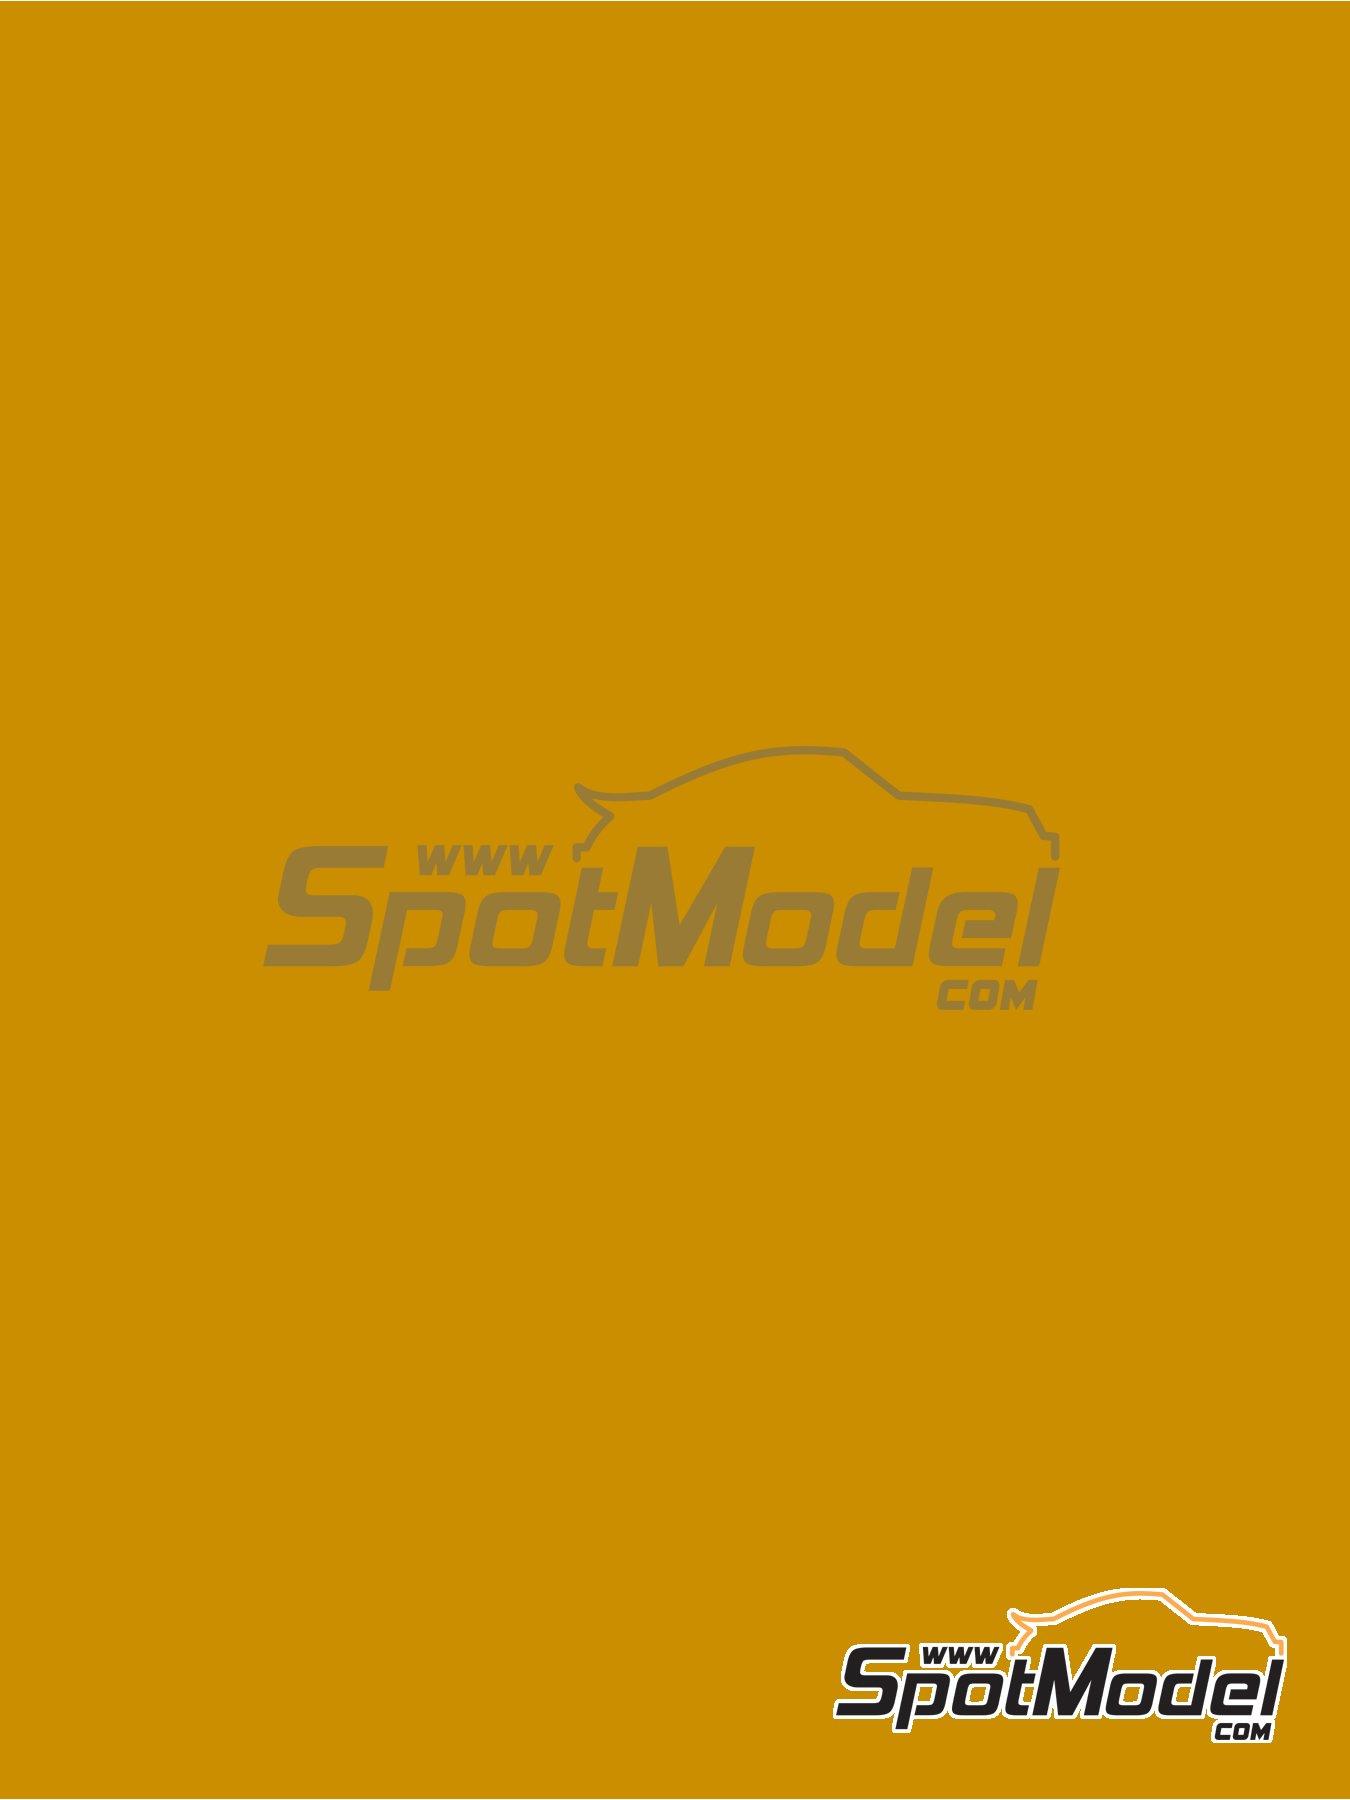 Amarillo miel - RAL1005 - Honey yellow - 1 x 60ml | Pintura fabricado por Zero Paints (ref.ZP-1033-RAL1005) image